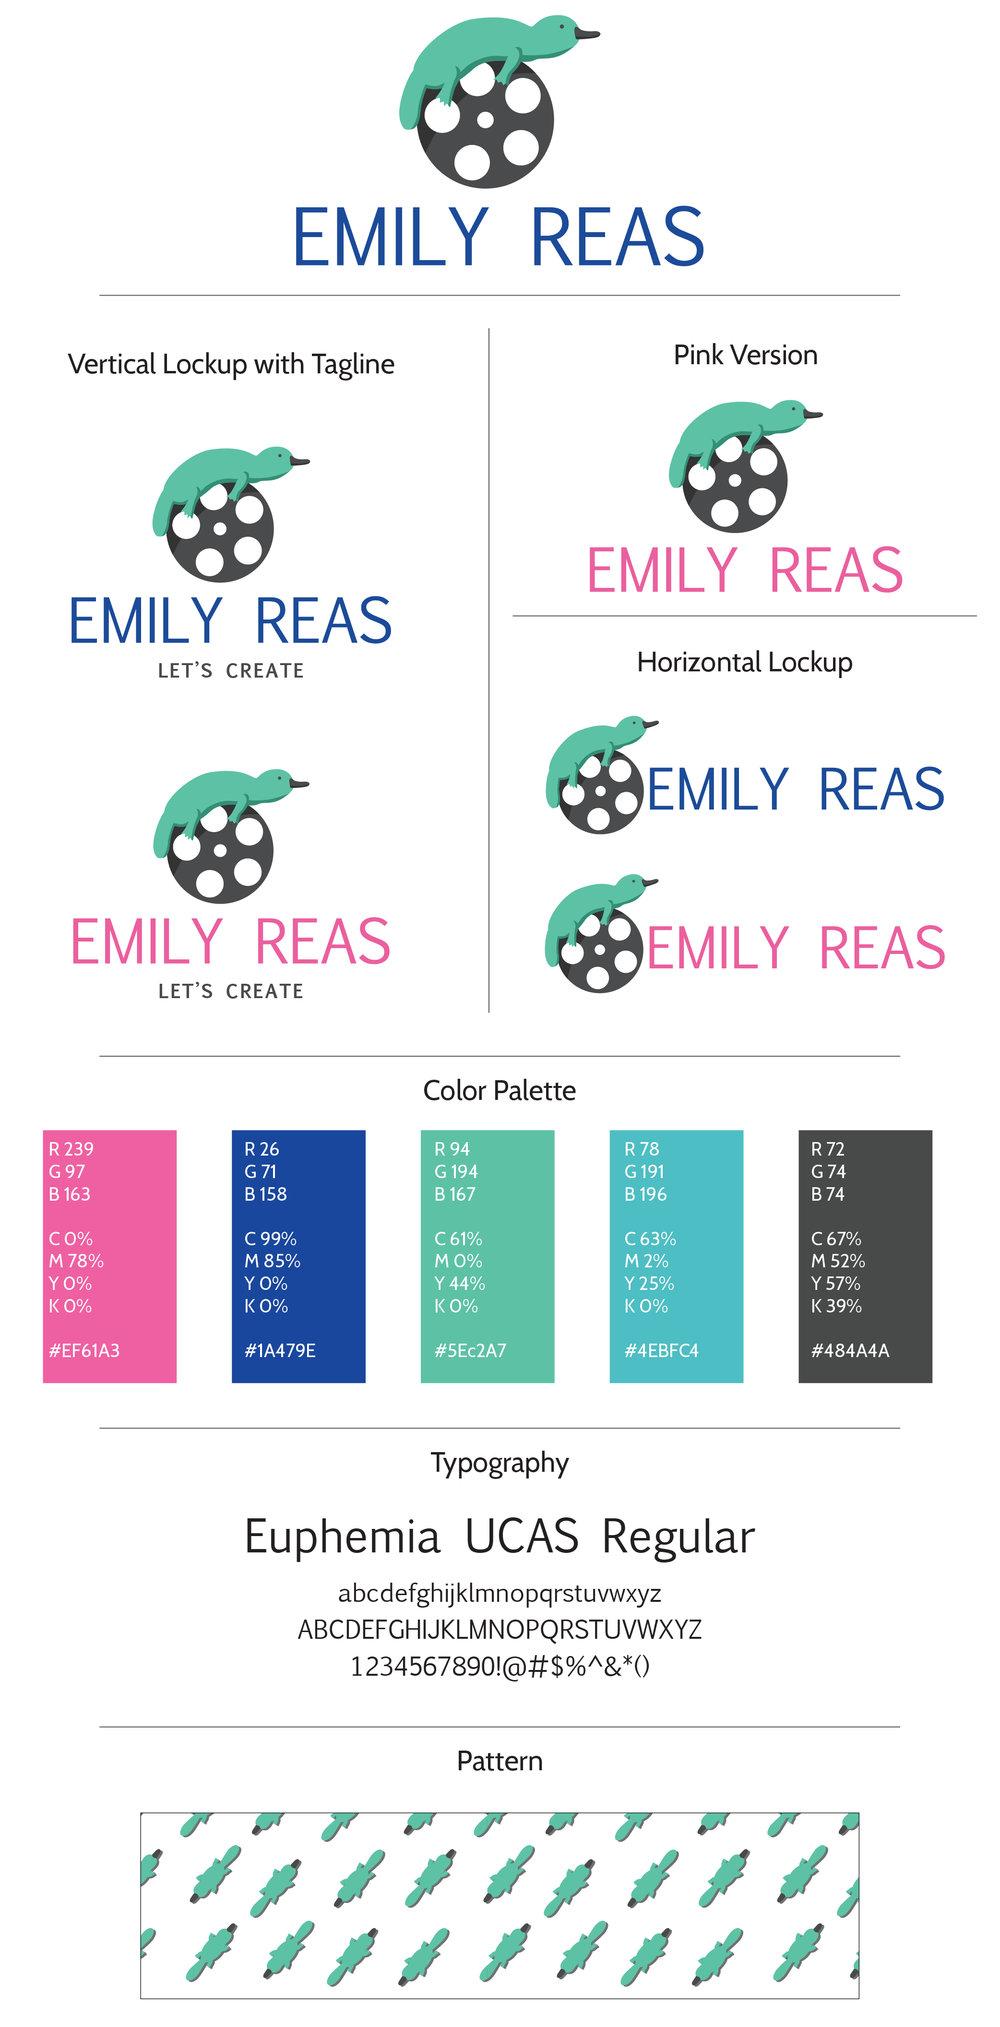 Emily Reas Brand Board